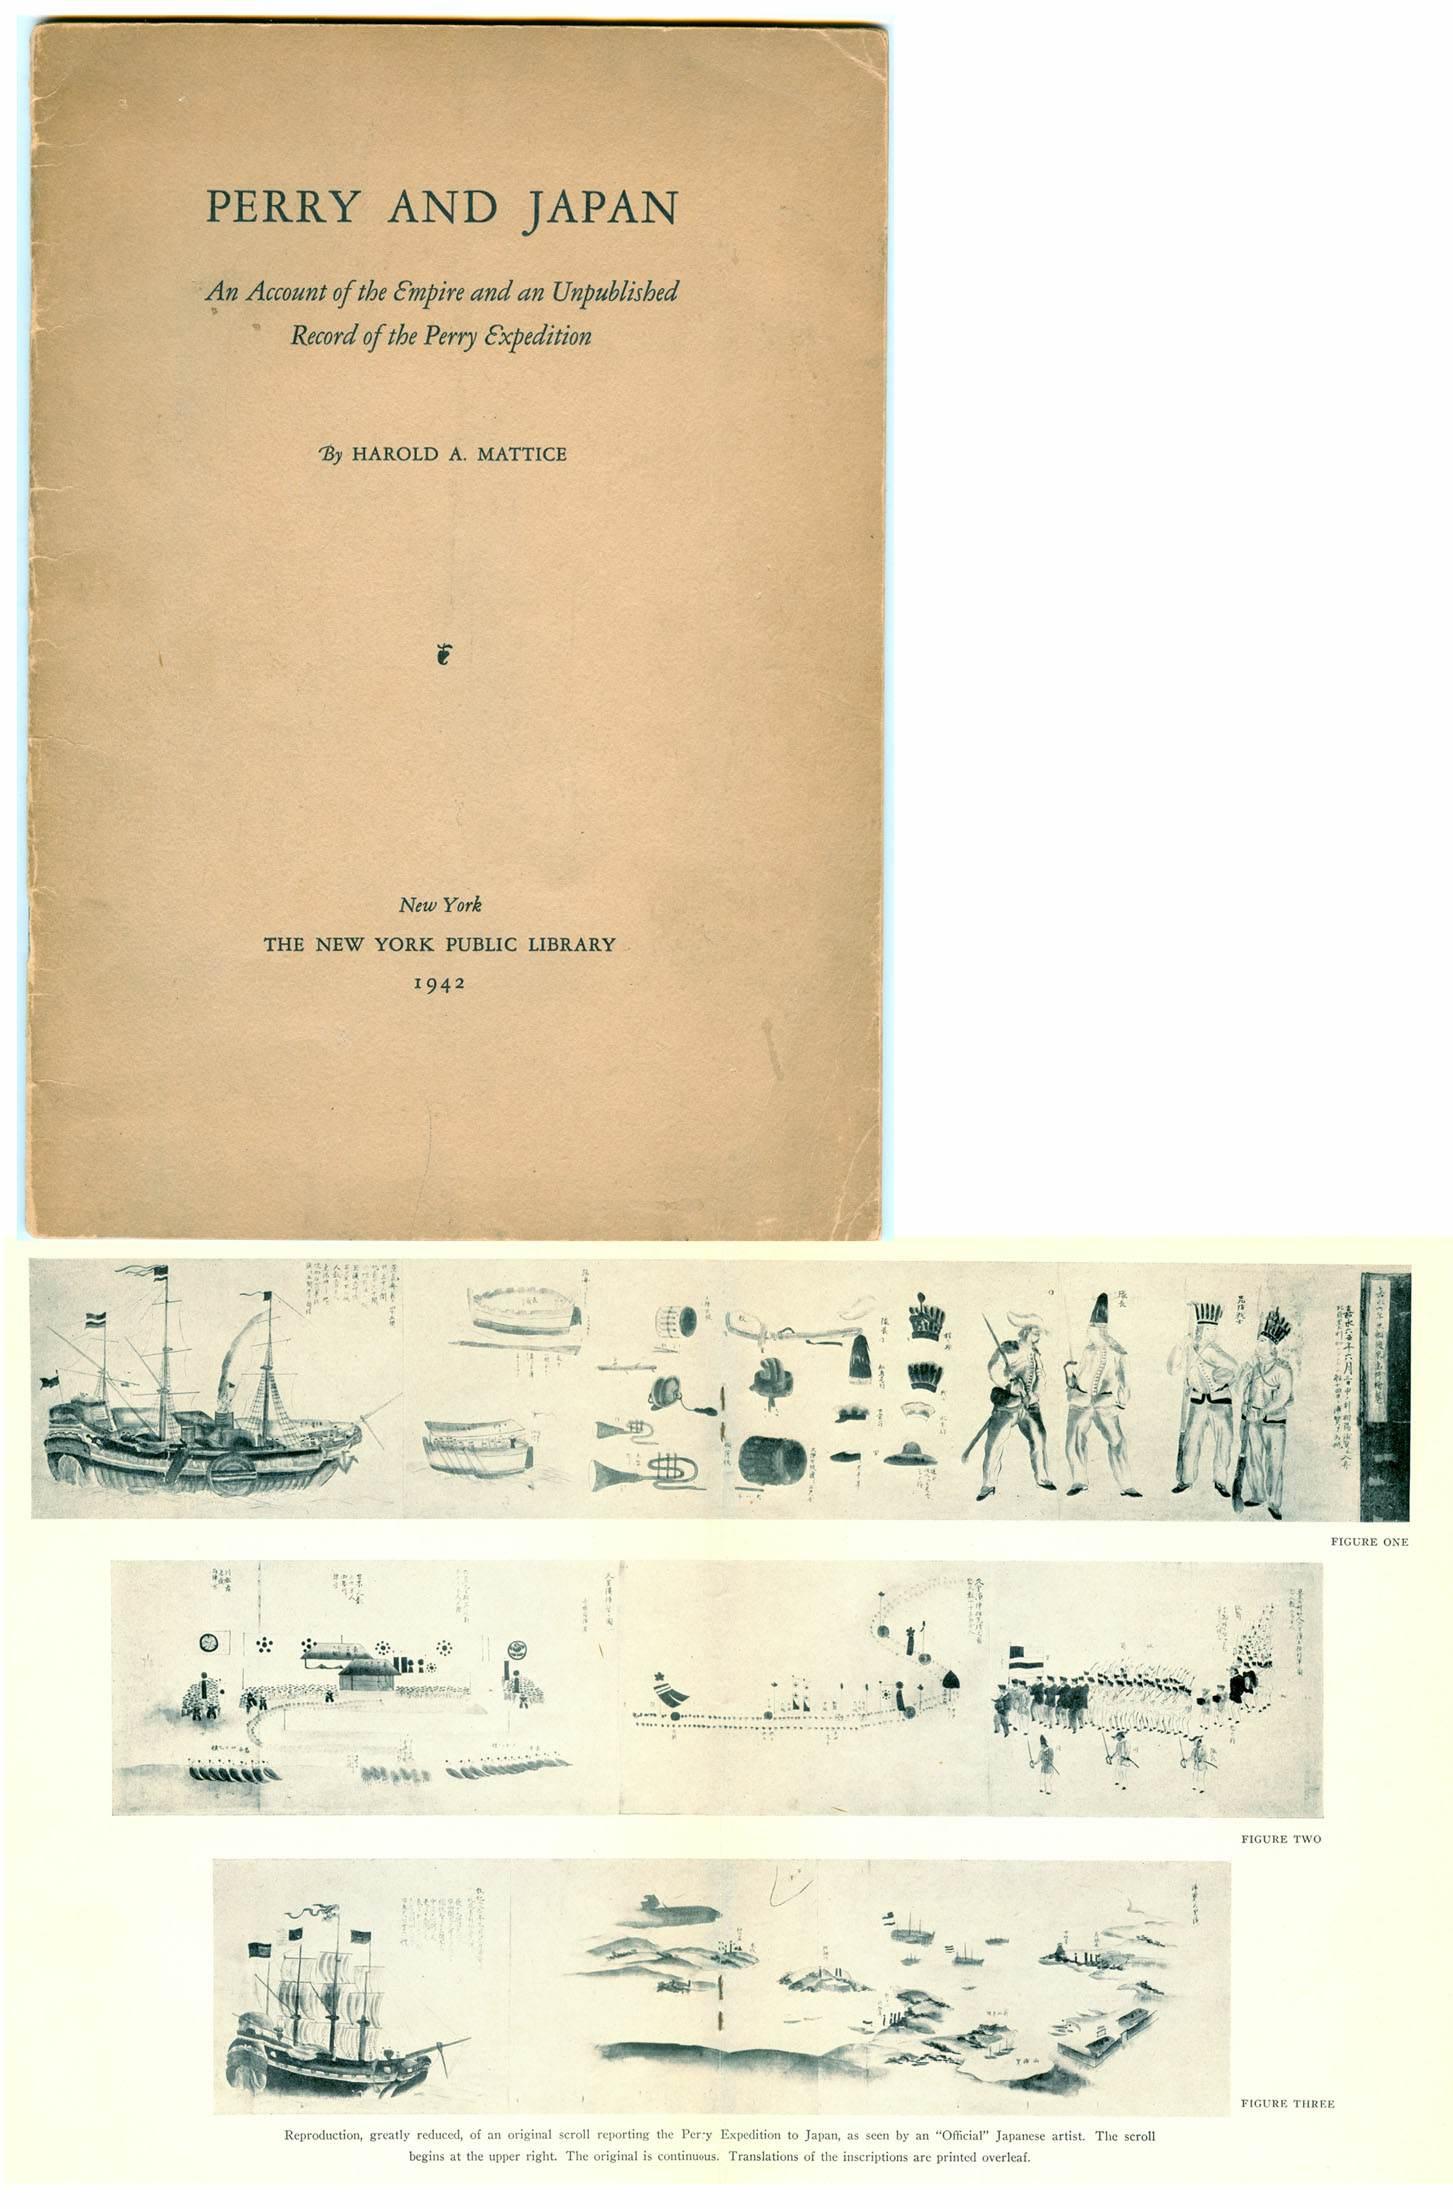 Repro Vintage Japanese Advertising Print #5 circa 1917 please see description